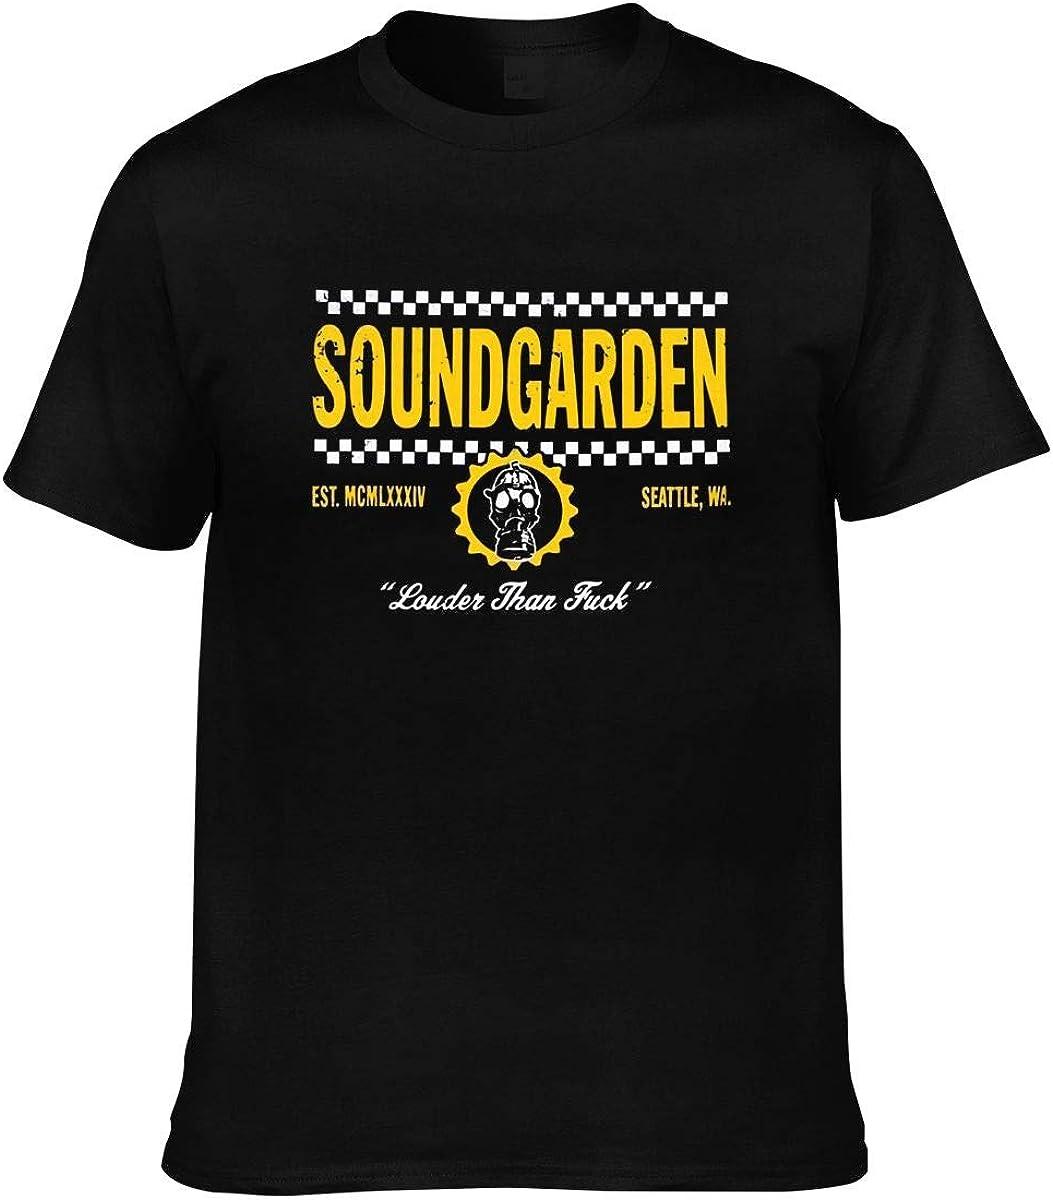 XIAO QIU Men's Sound Garden T-Shirt Active Performance Moisture Wicking Technology.